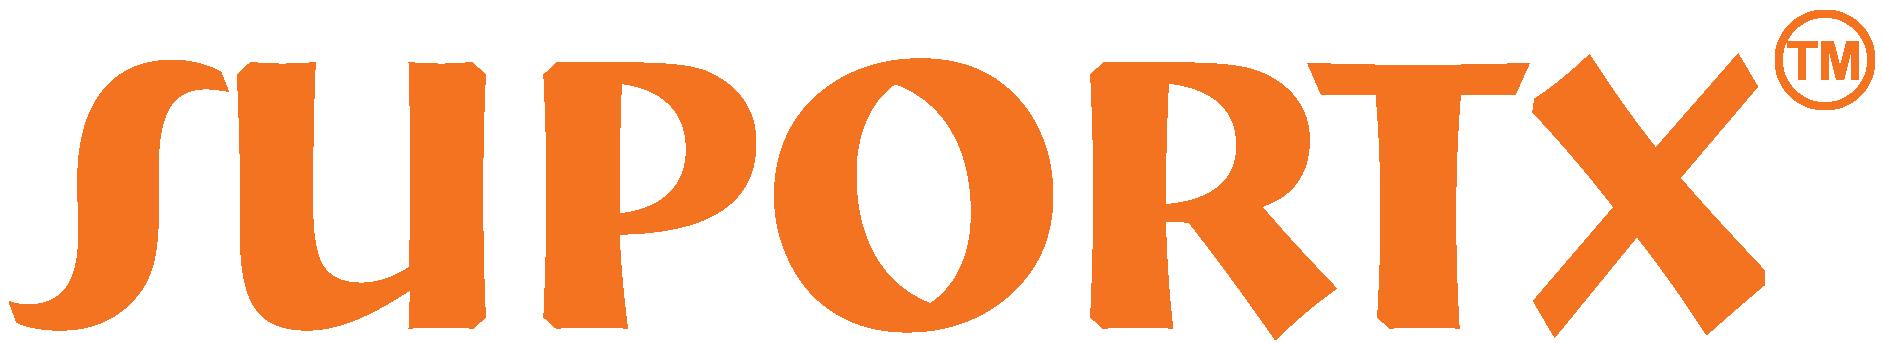 SUPORTX Logo